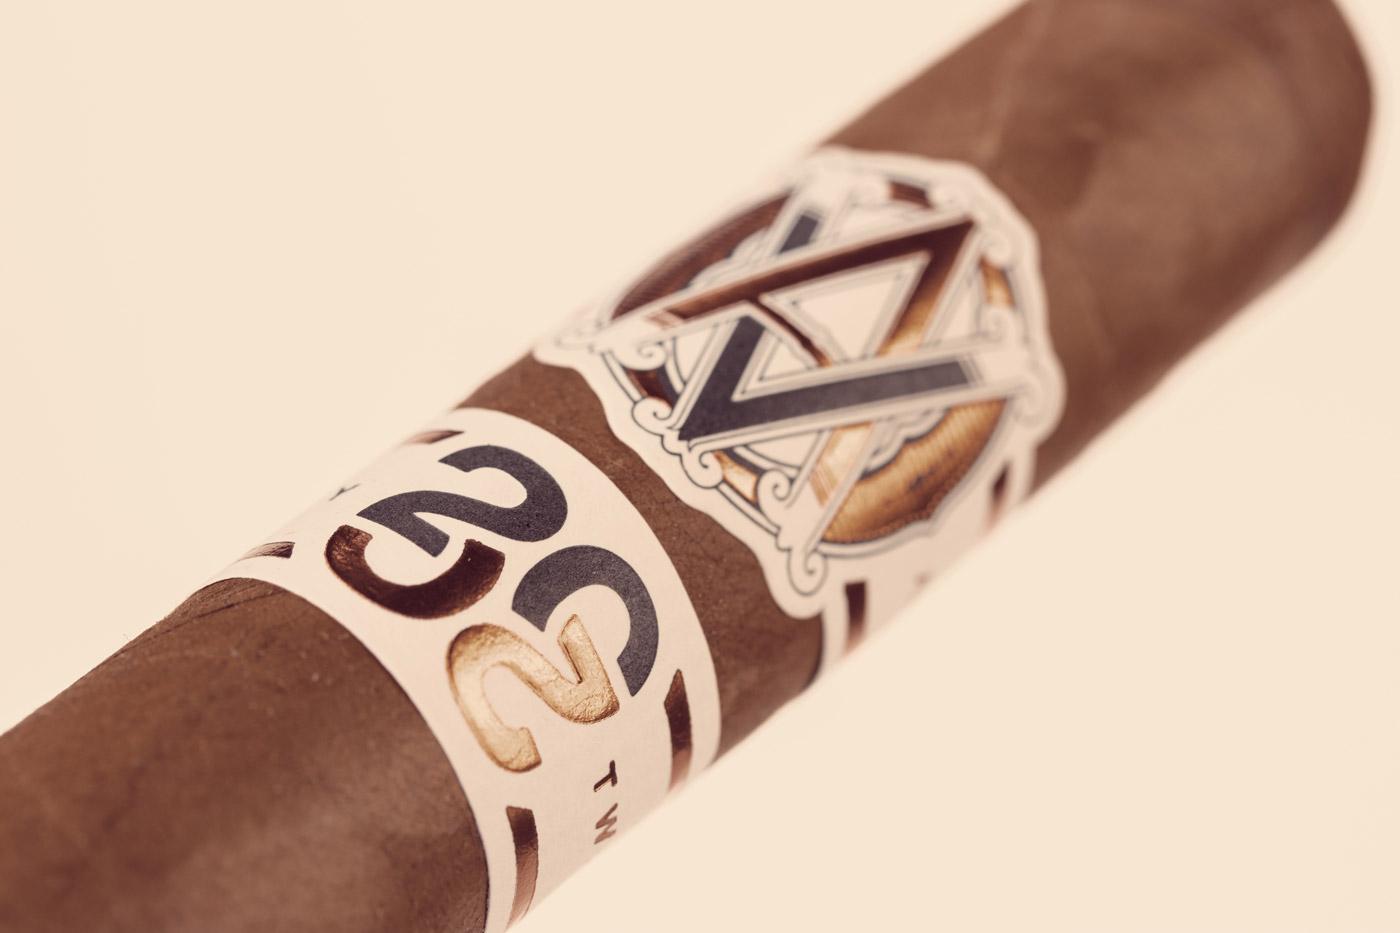 AVO Improvisation Series LE20 cigar review